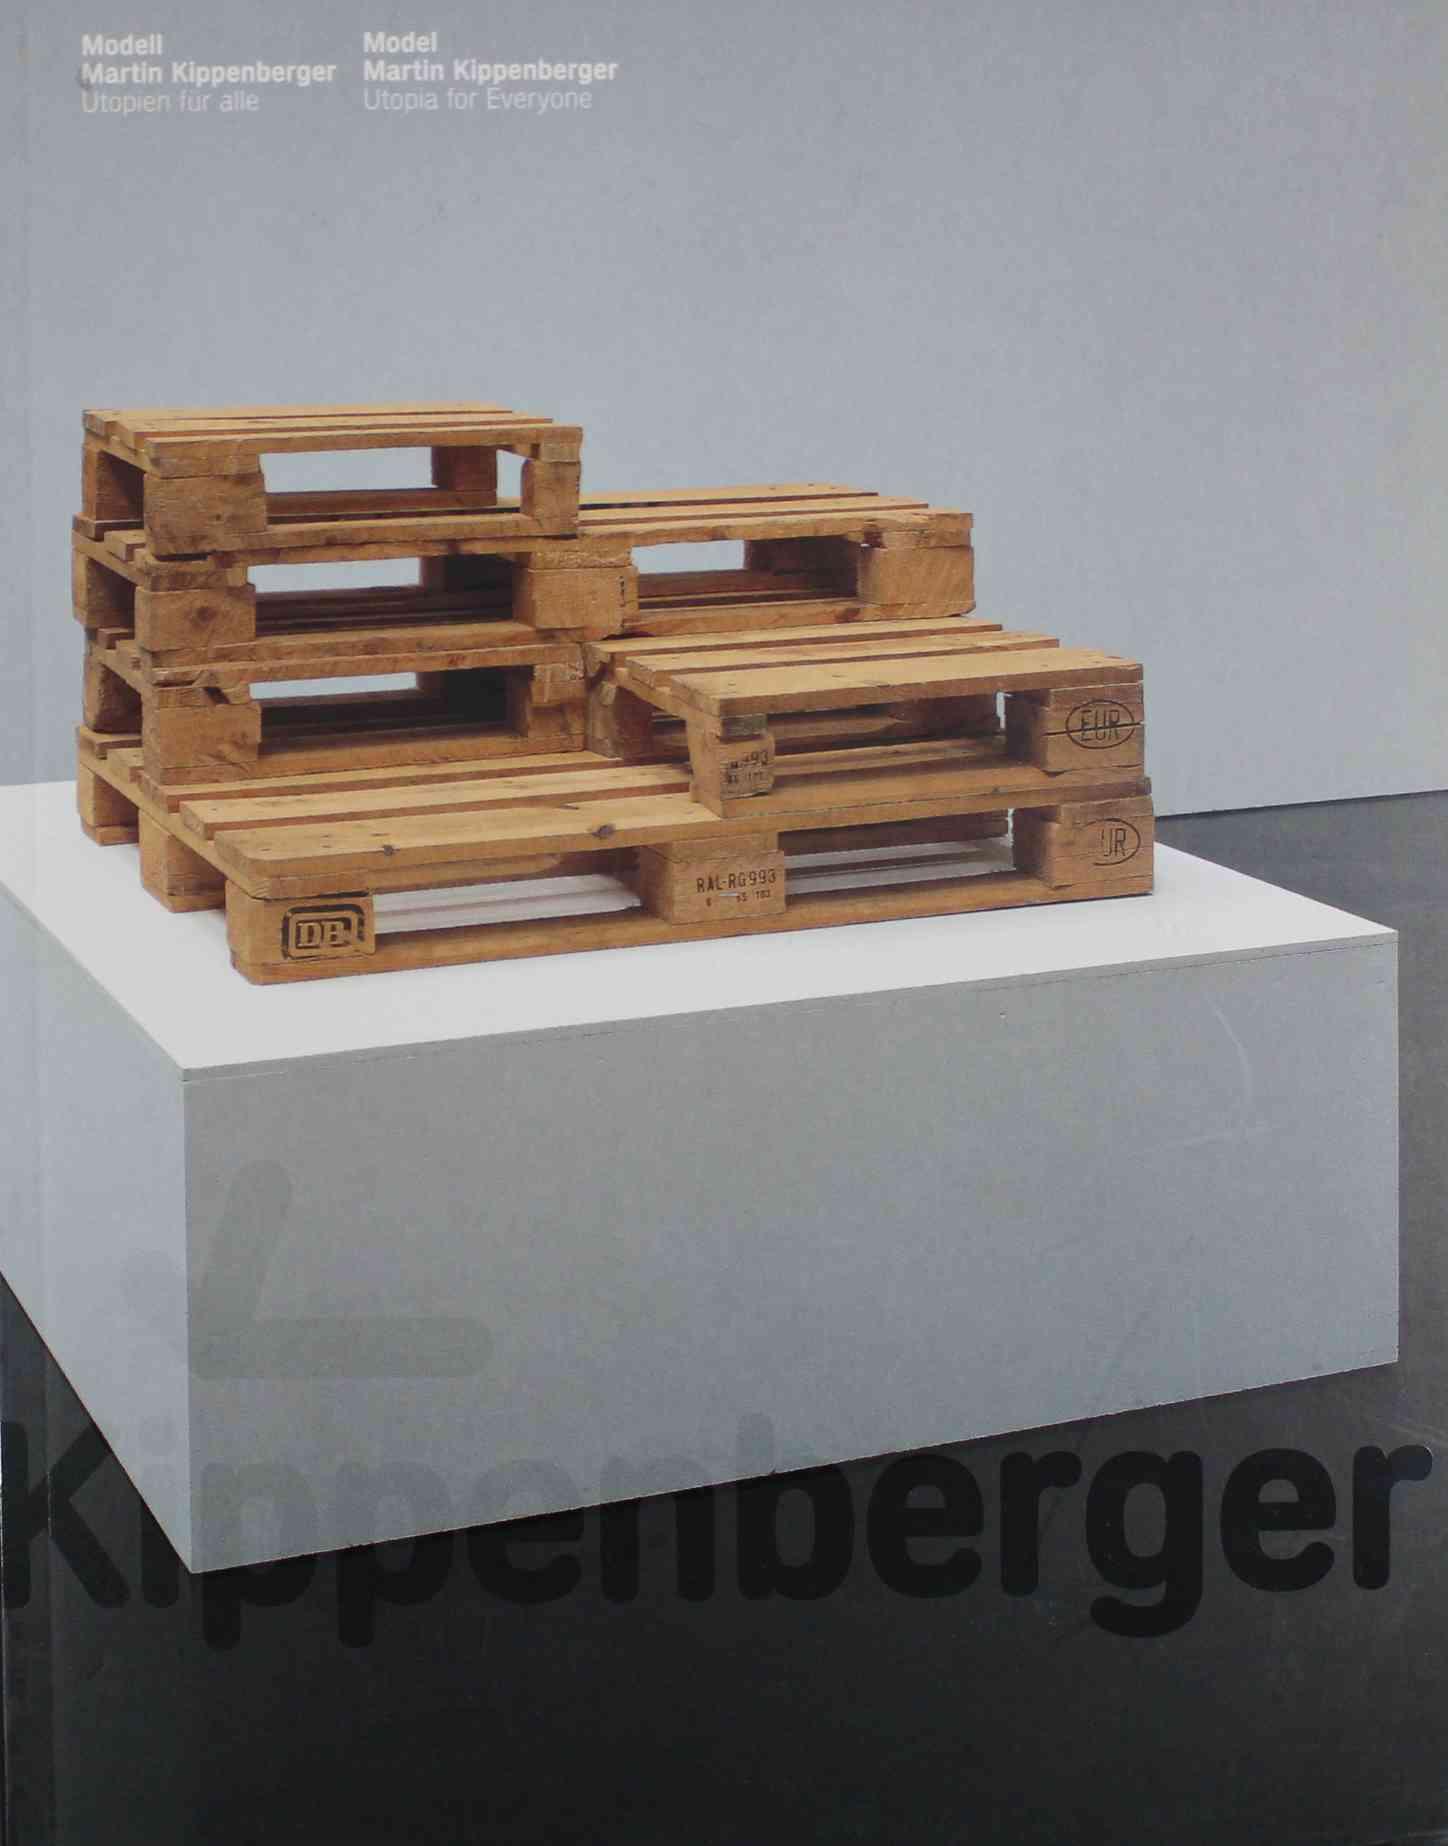 Modell Martin Kippenberger - Utopien Fuer Alle: Kippenberger, Martin .